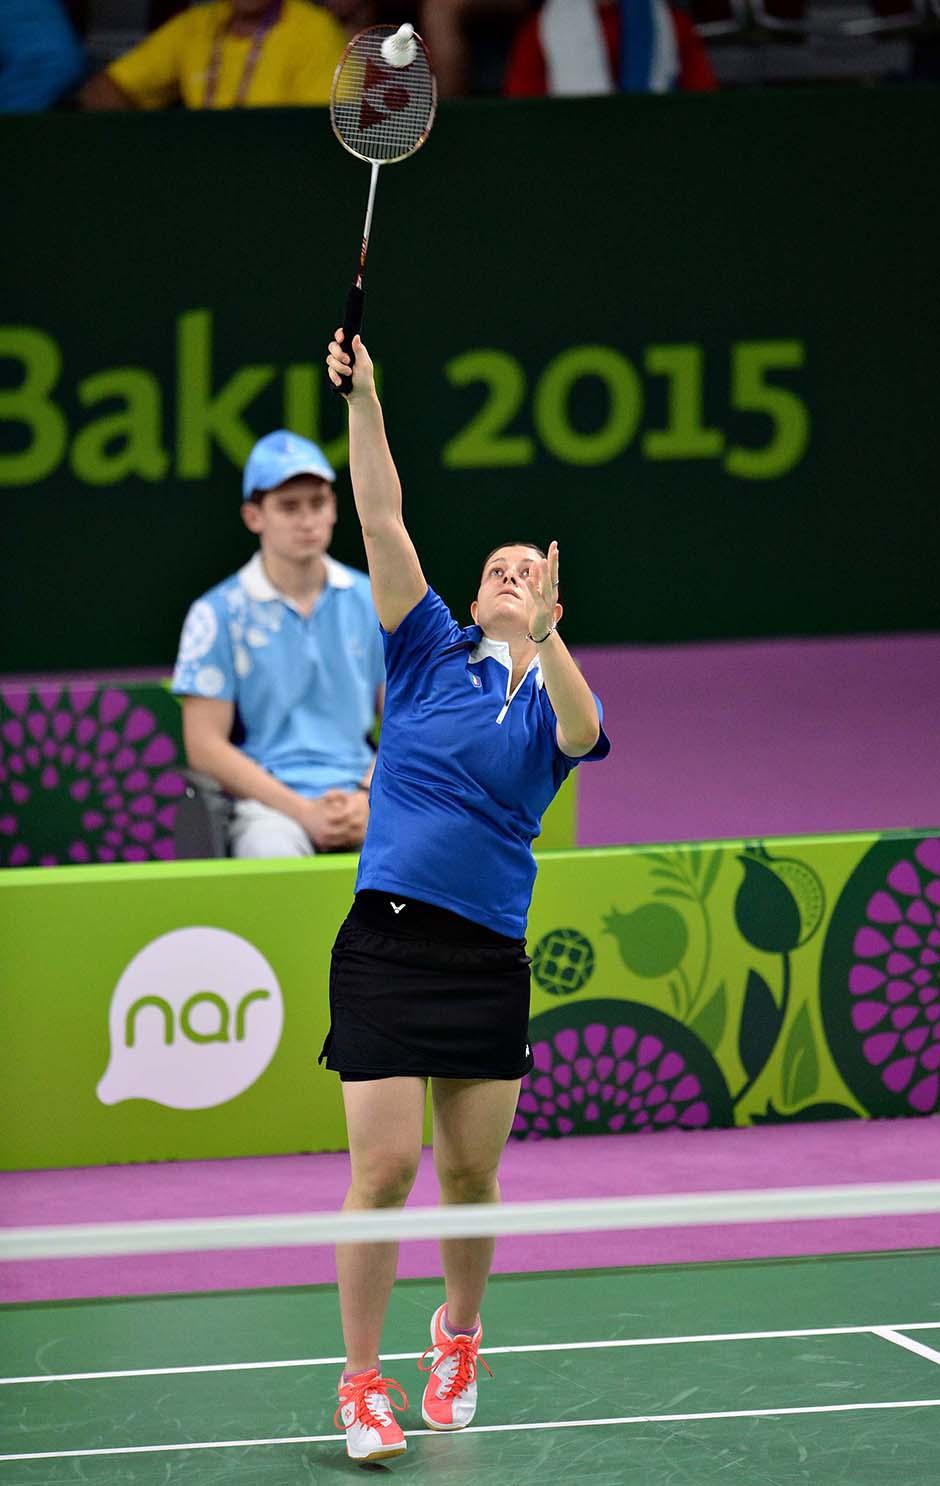 25 Badminton Cicognini DEN foto Ferraro GMT 001